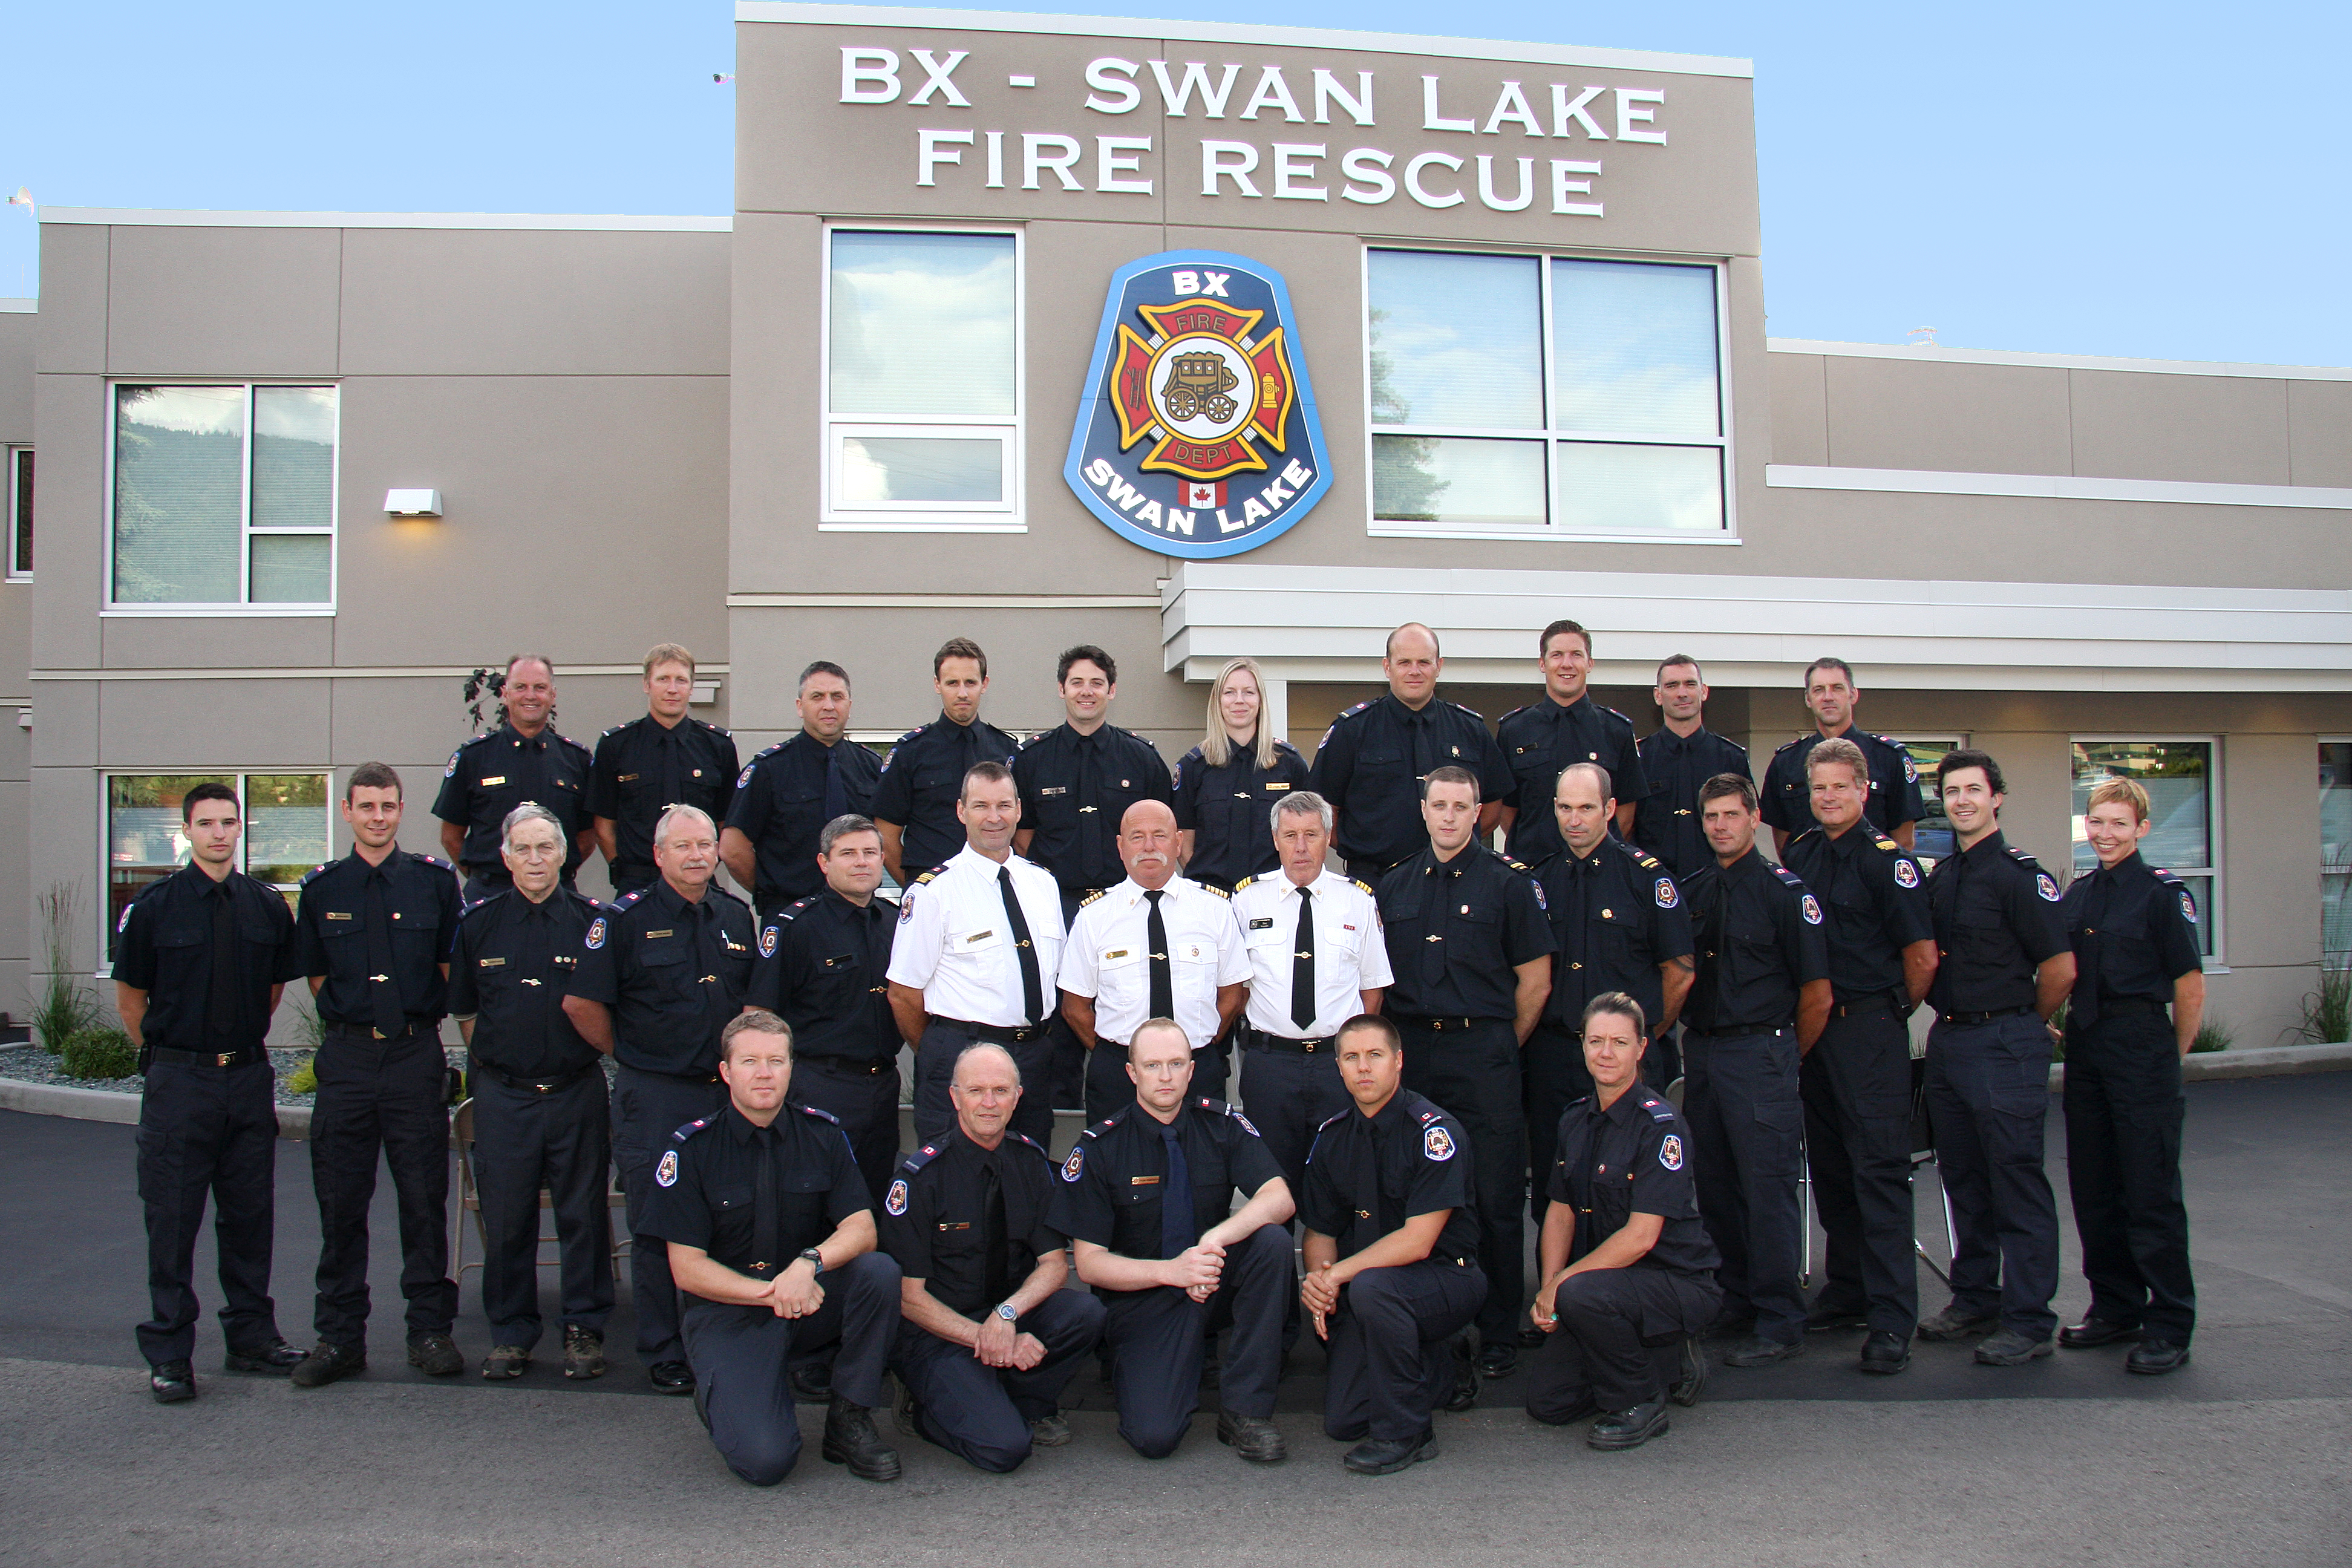 BX Swan Lake Fire Rescue 2016 Team